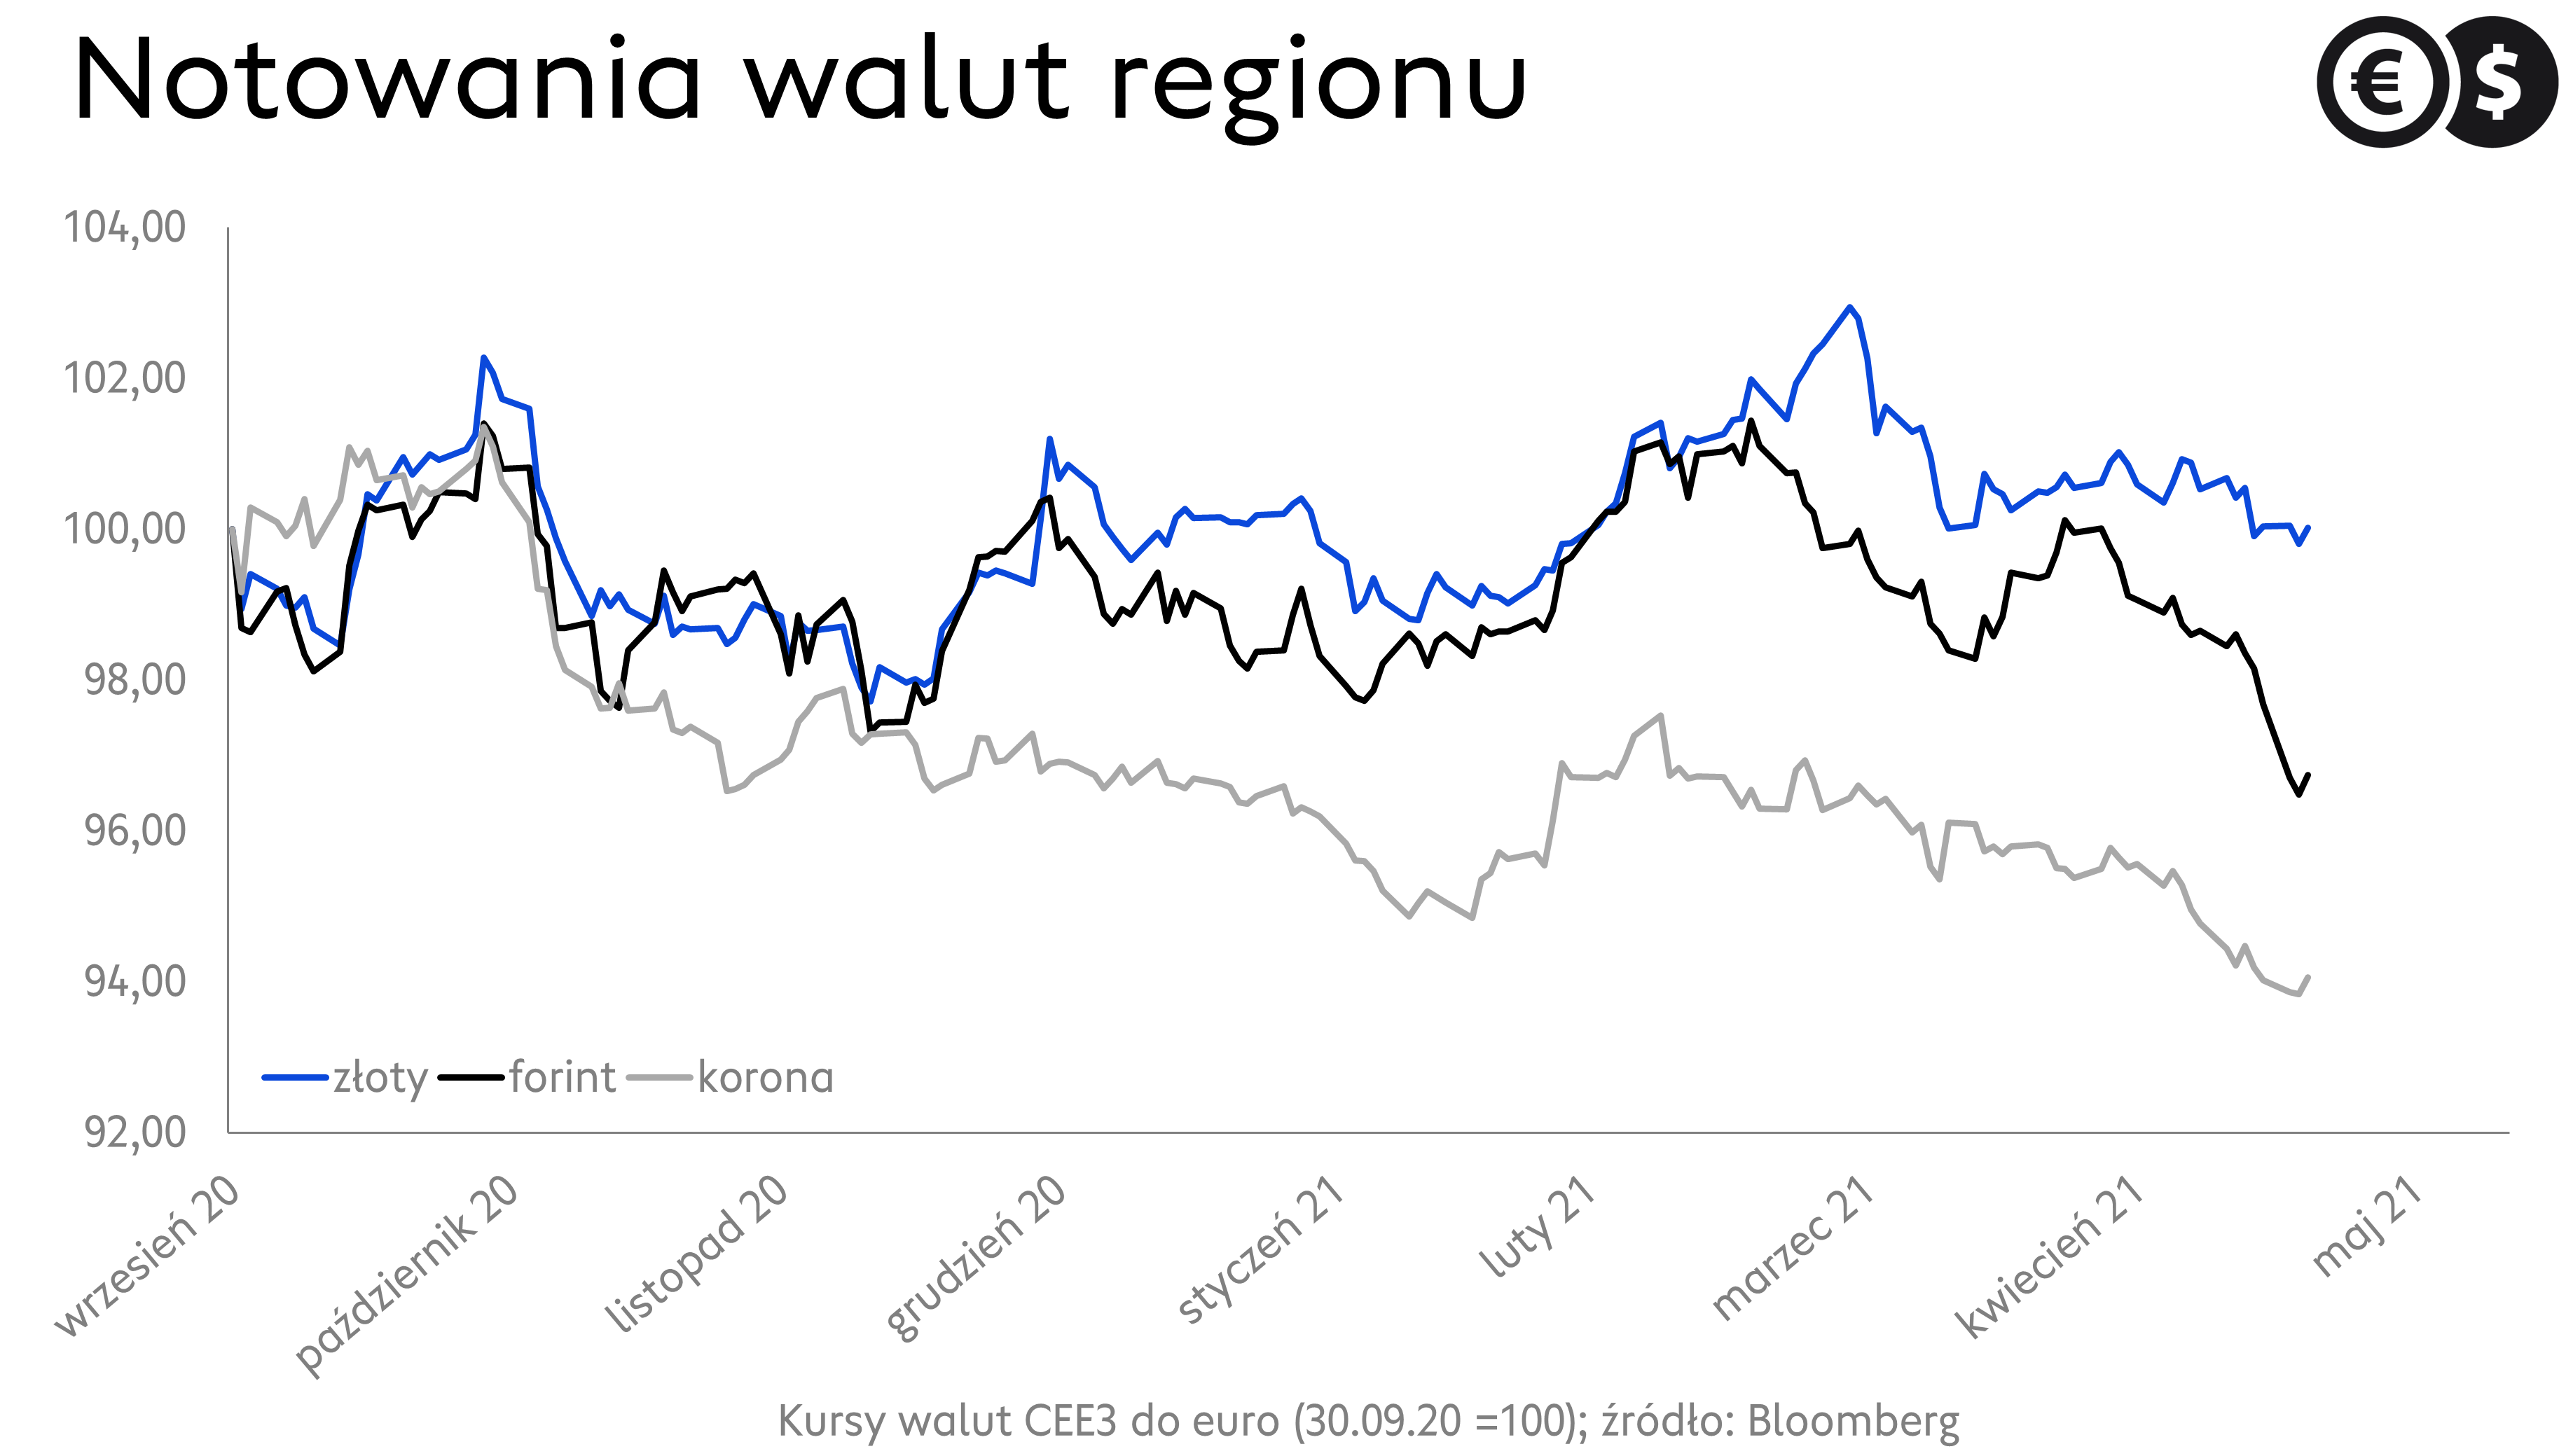 Kursy walut, notowania EUR/PLN, EUR/CZK i EUR/HUF; źródło: Bloomberg